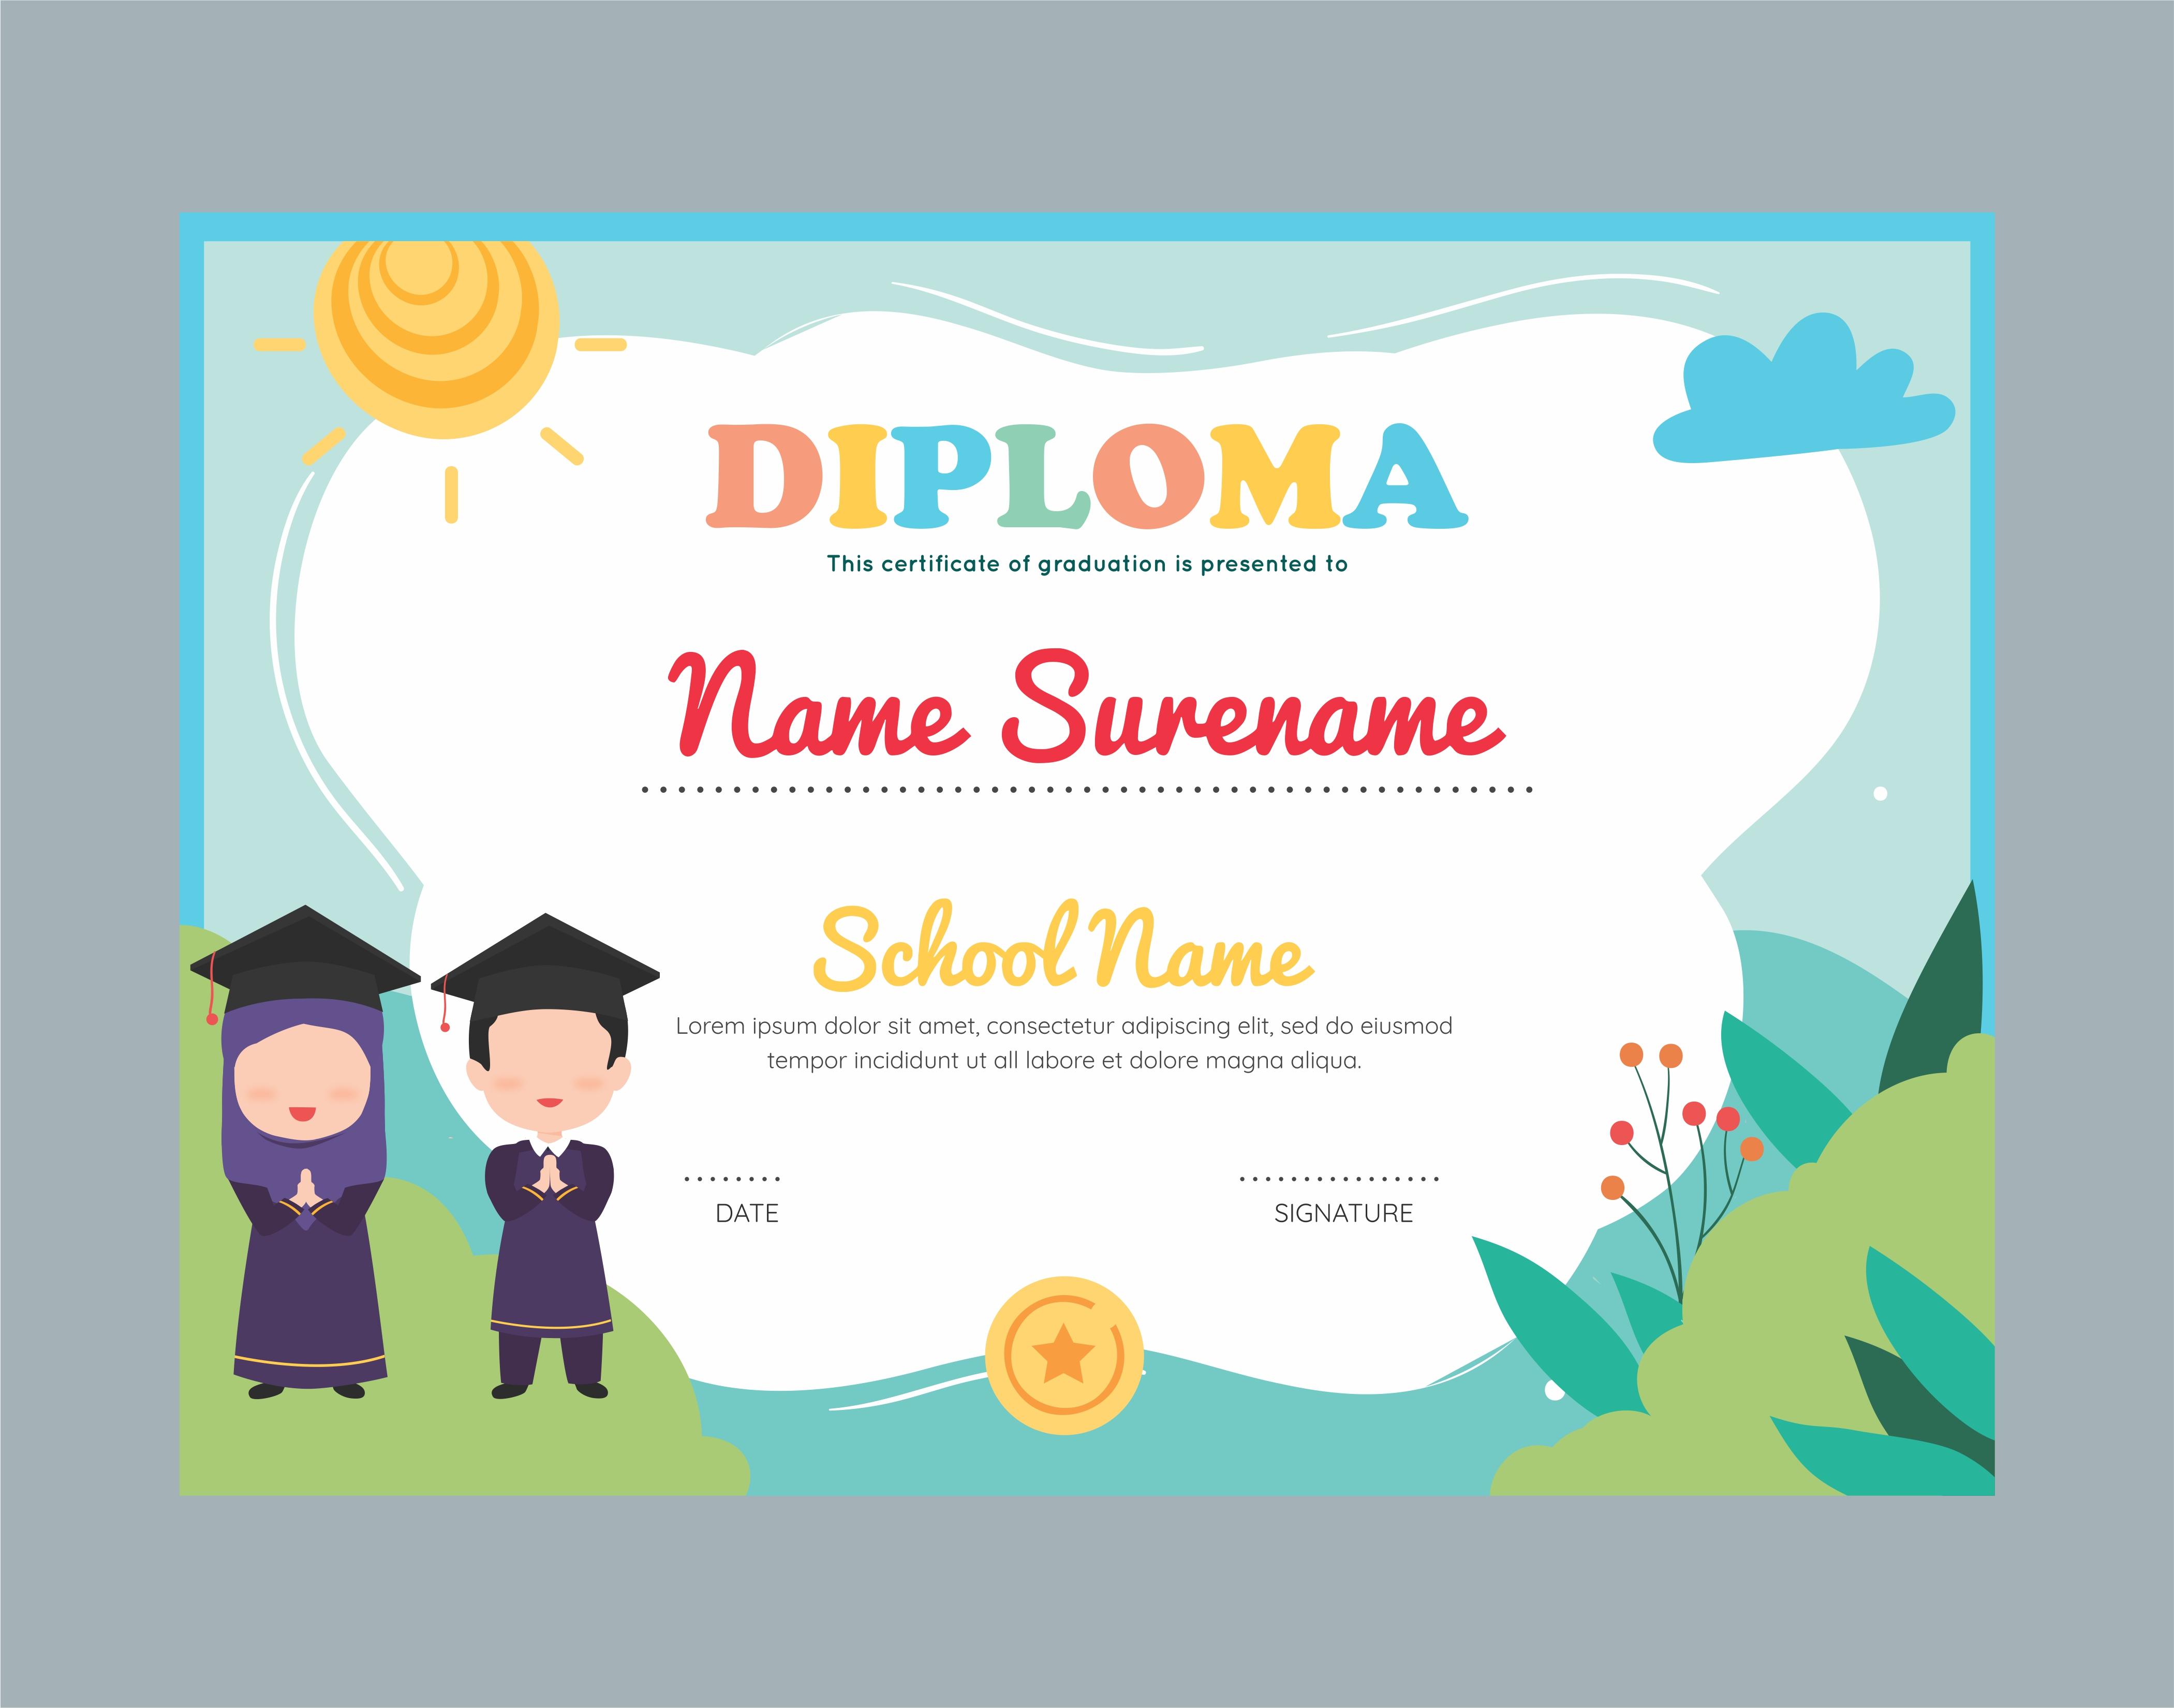 Muslim garden diploma certificate template for kids 21 Vector For Preschool Graduation Certificate Template Free